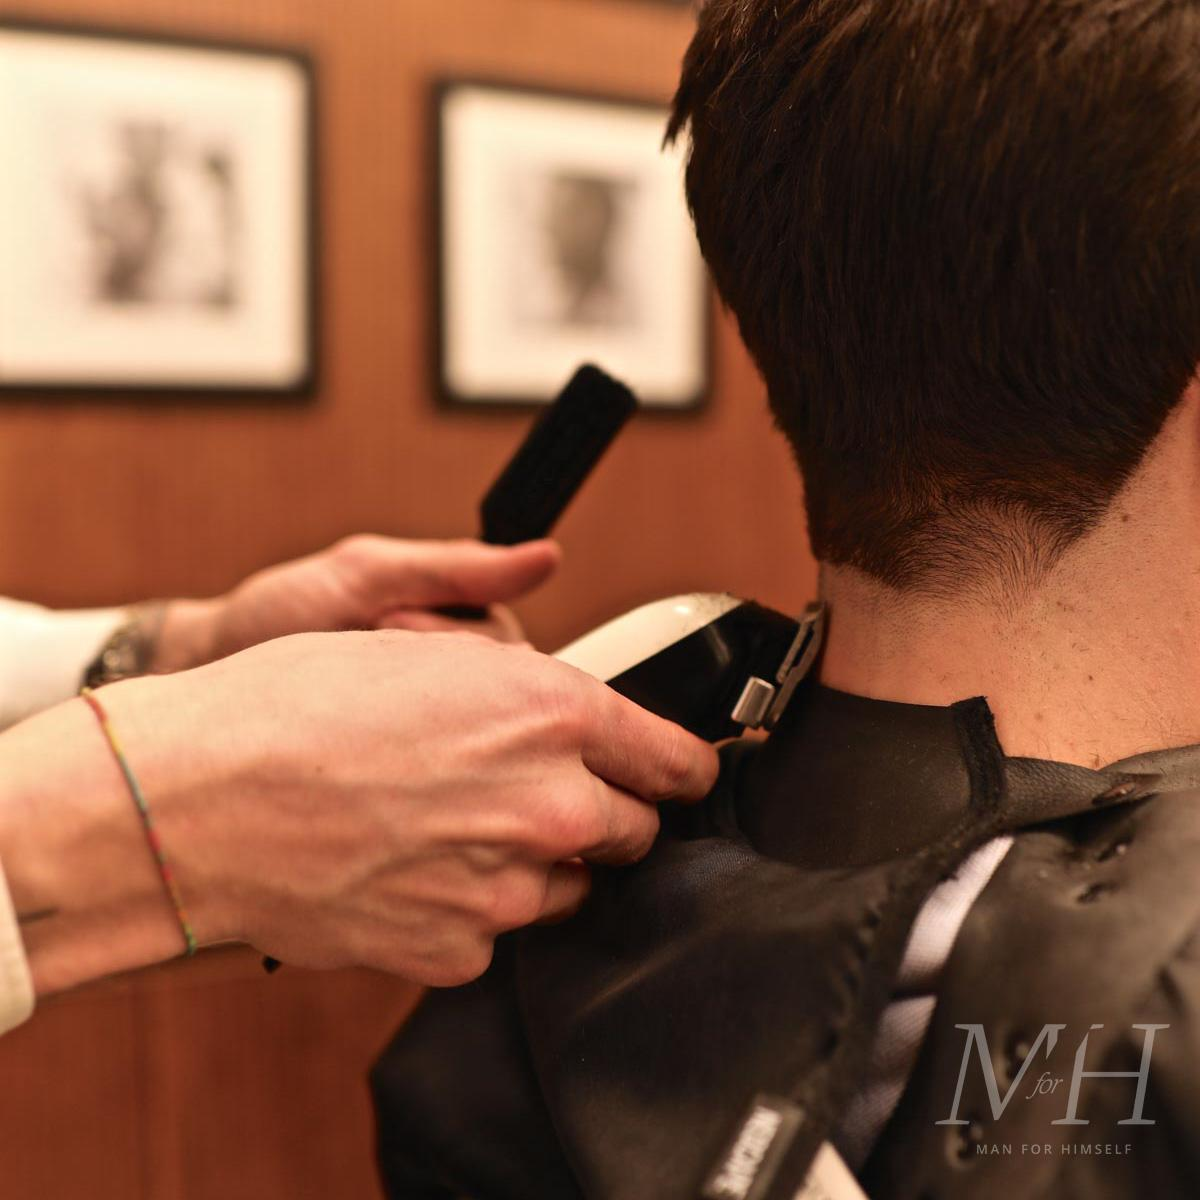 acqua-di-parma-uk-barbershop-man-for-himself-attractive